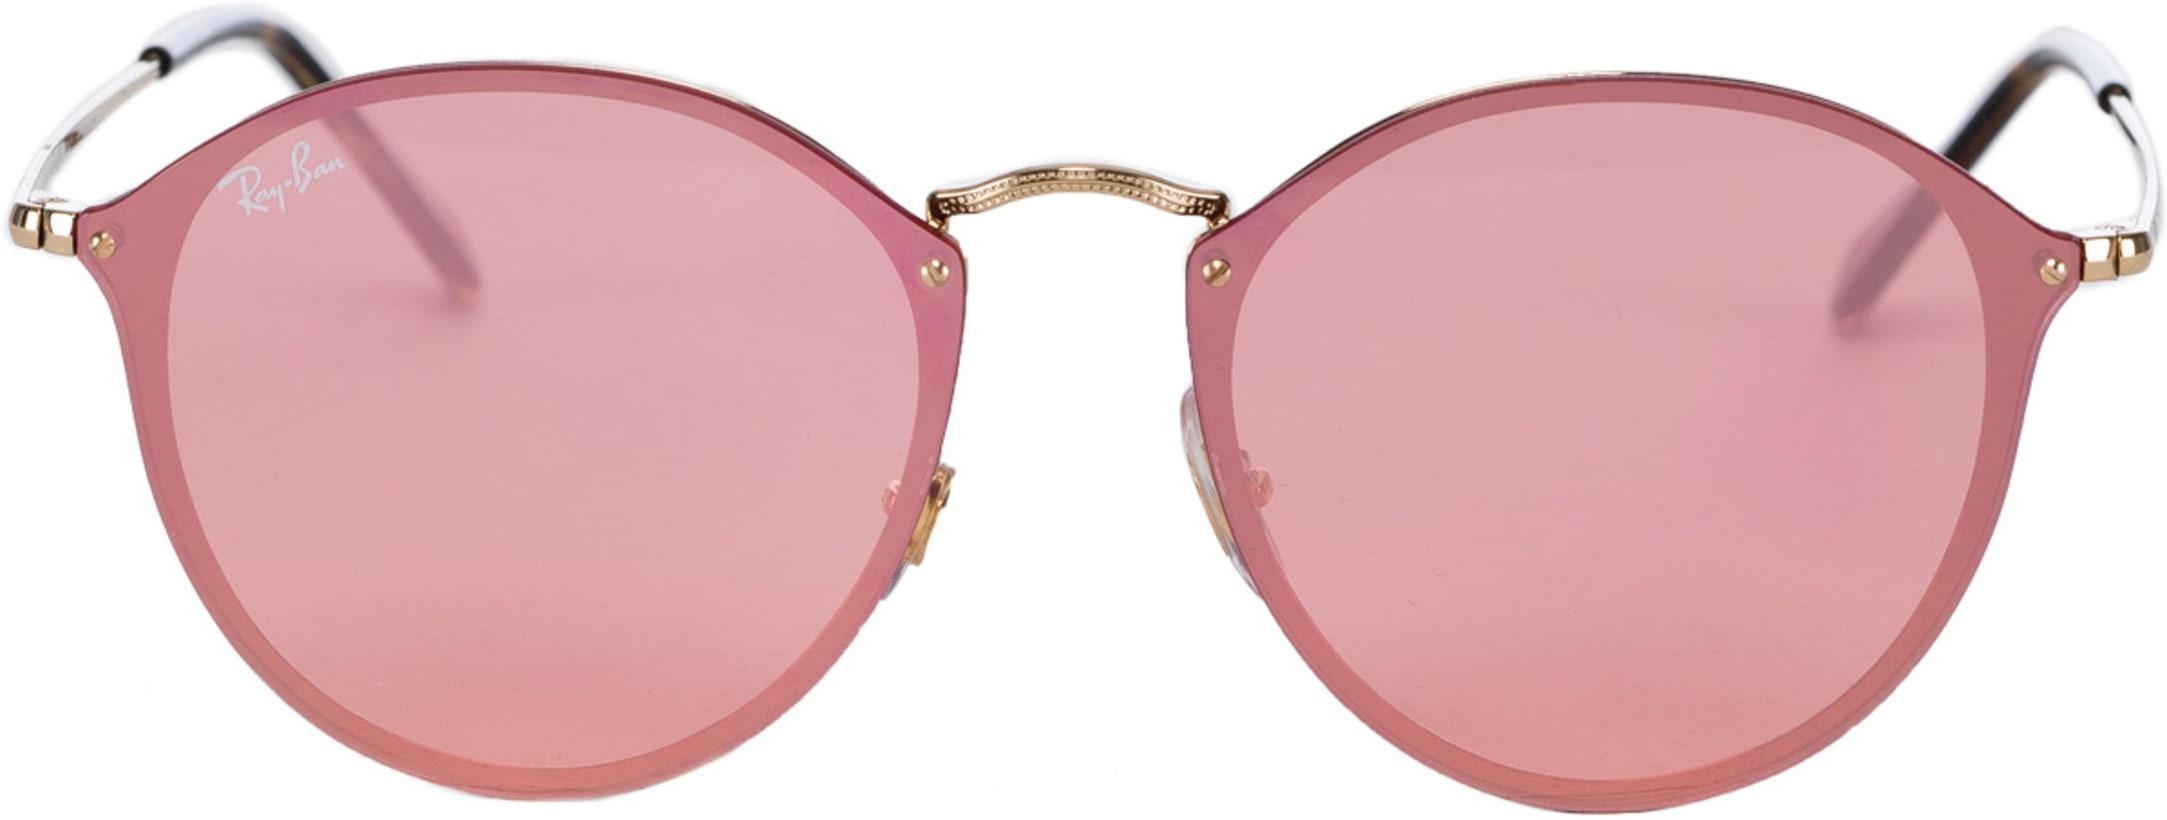 1b80c8acb709 Ray-Ban: Blaze Round Sunglasses - Gold/Pink Mirror | influenceu